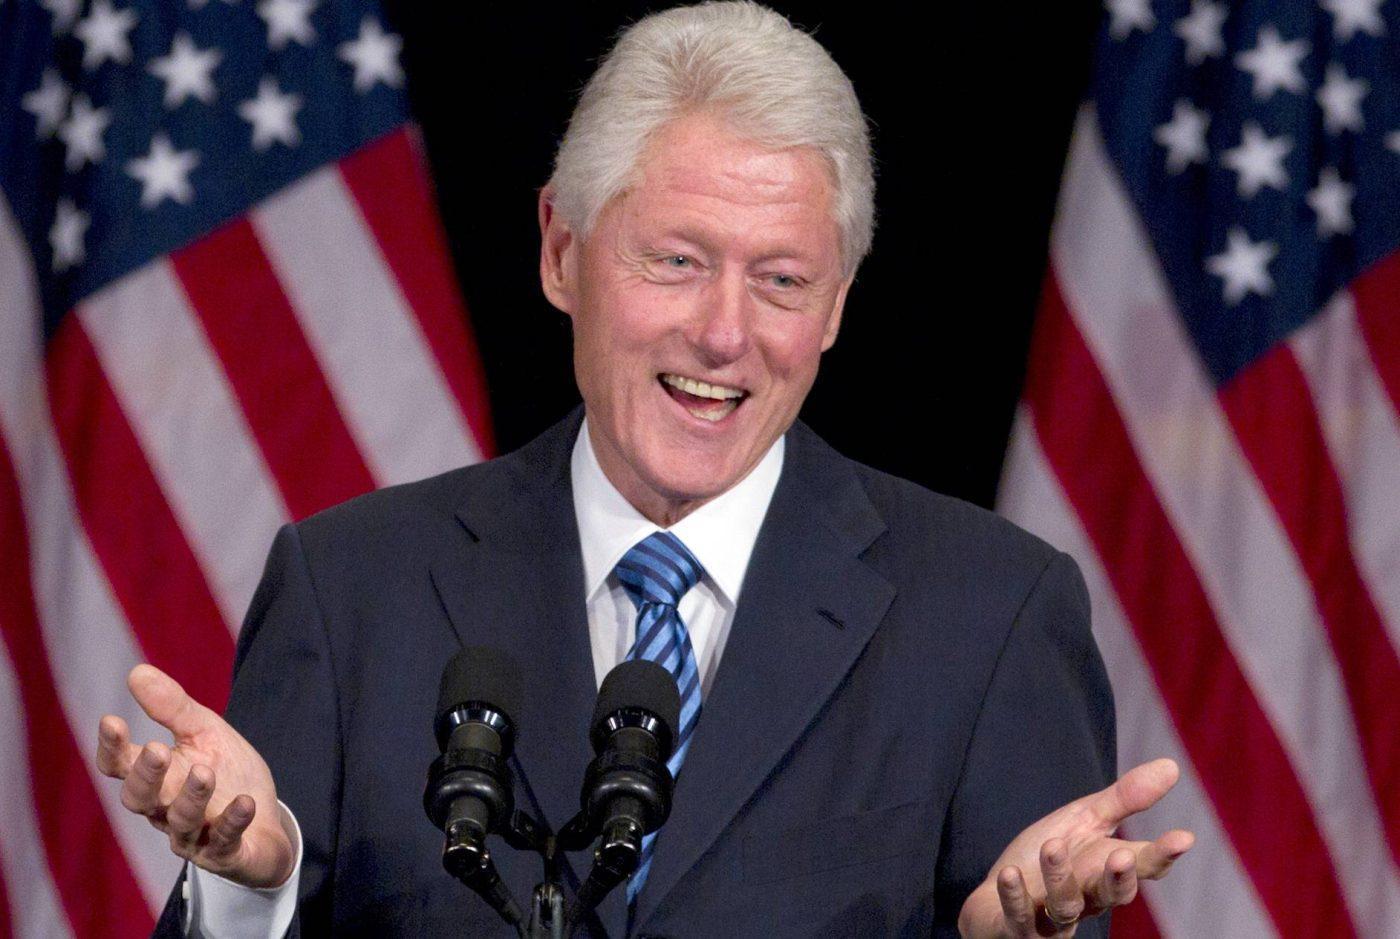 Bill Clinton Biography - 1566311001 Bill Clinton Biography